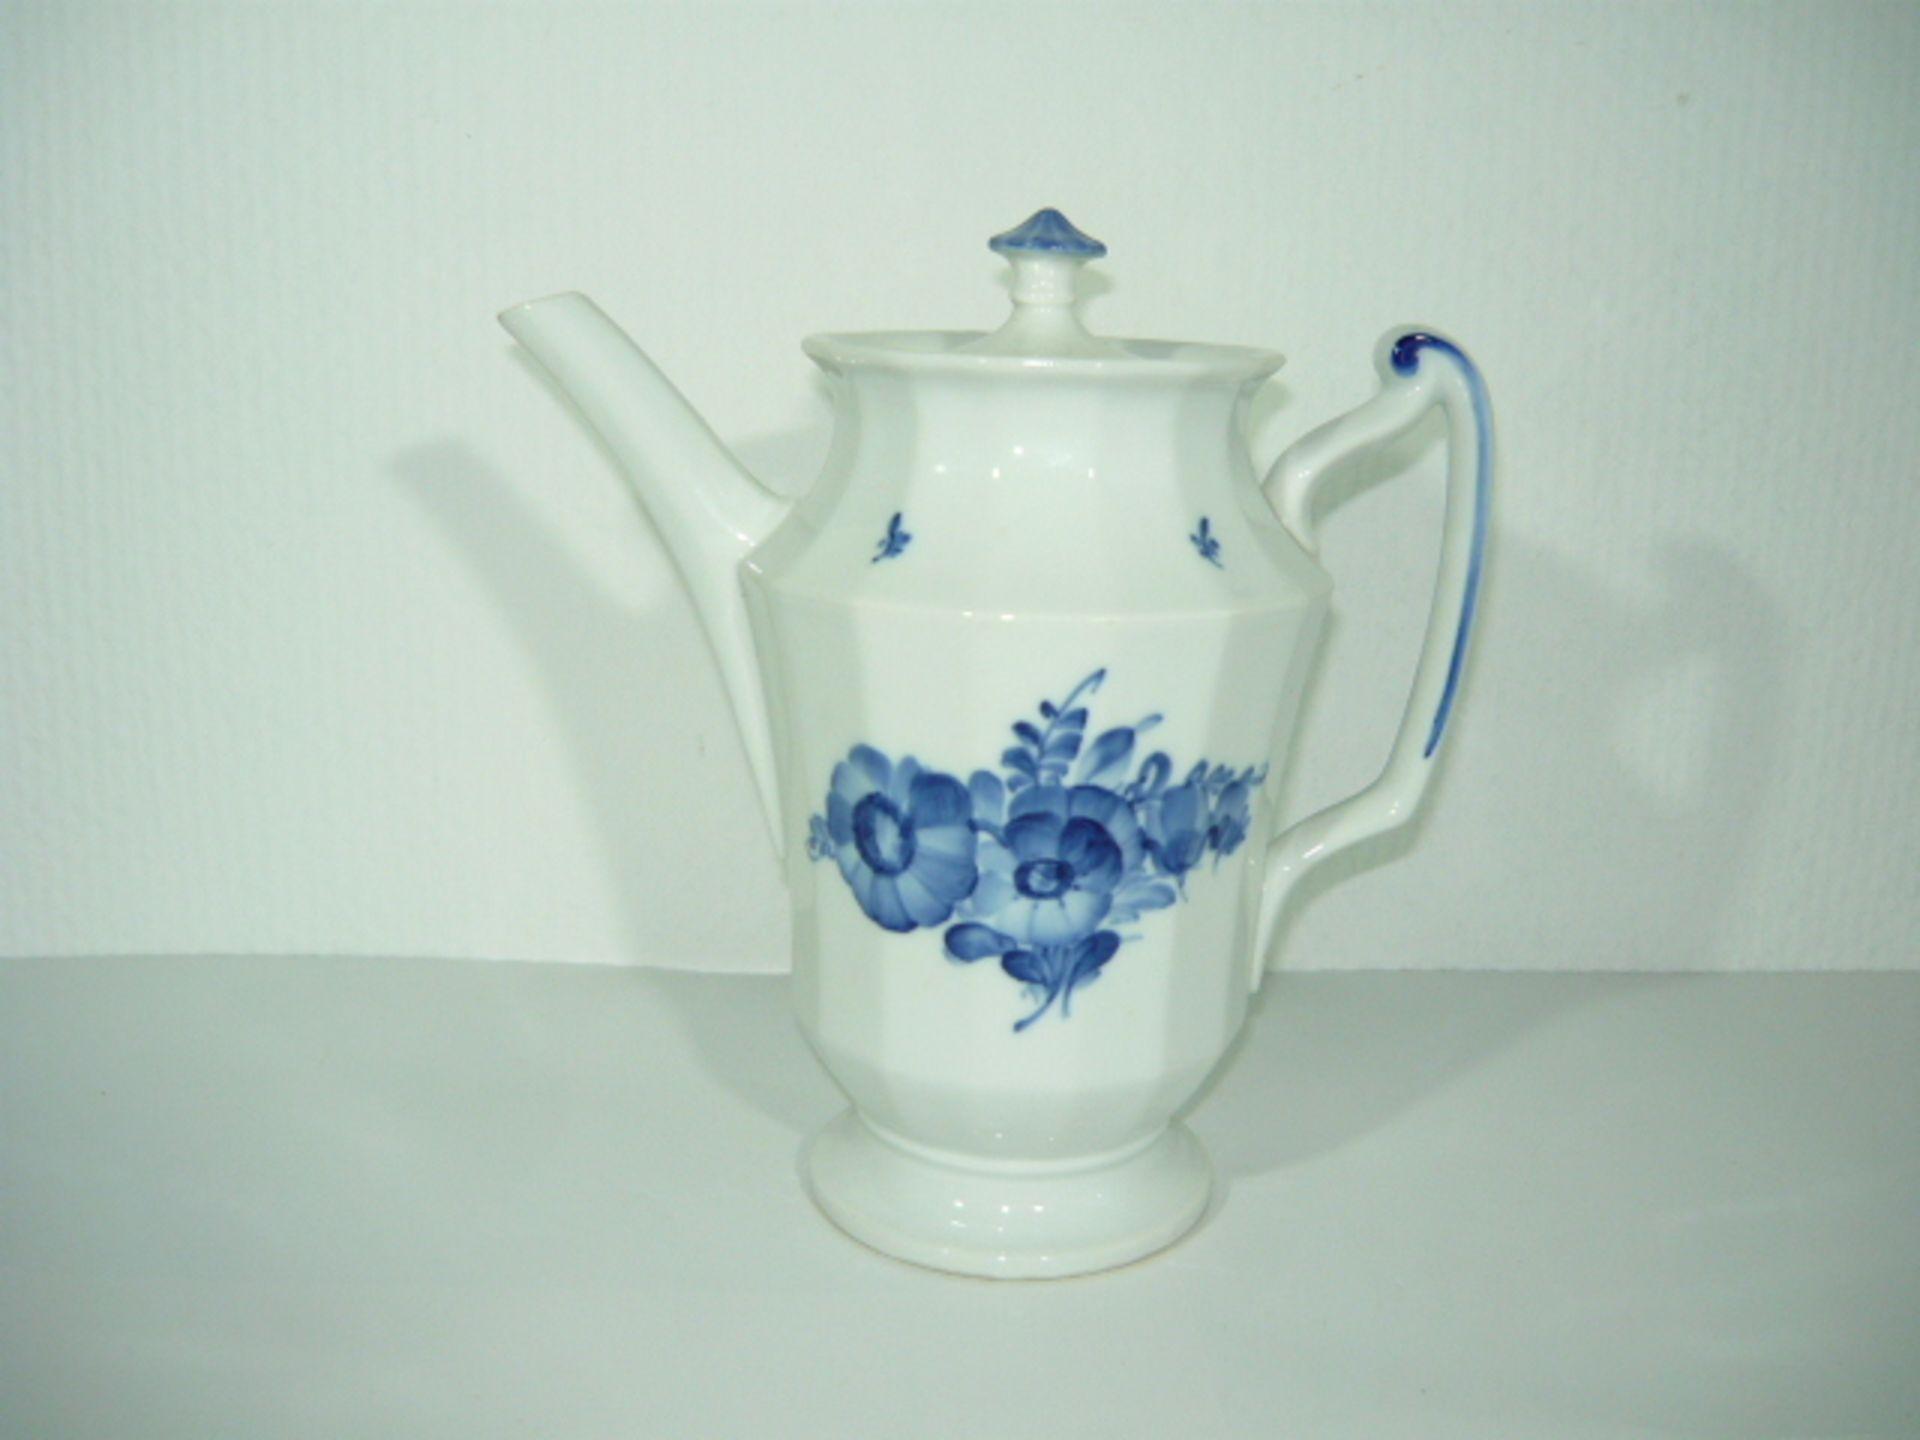 Royal Copenhagen. Blaue Blume. Große Kaffeekanne. II.W. H ca. 25cm. KOSTENLOSER VERSAND INNERHALB